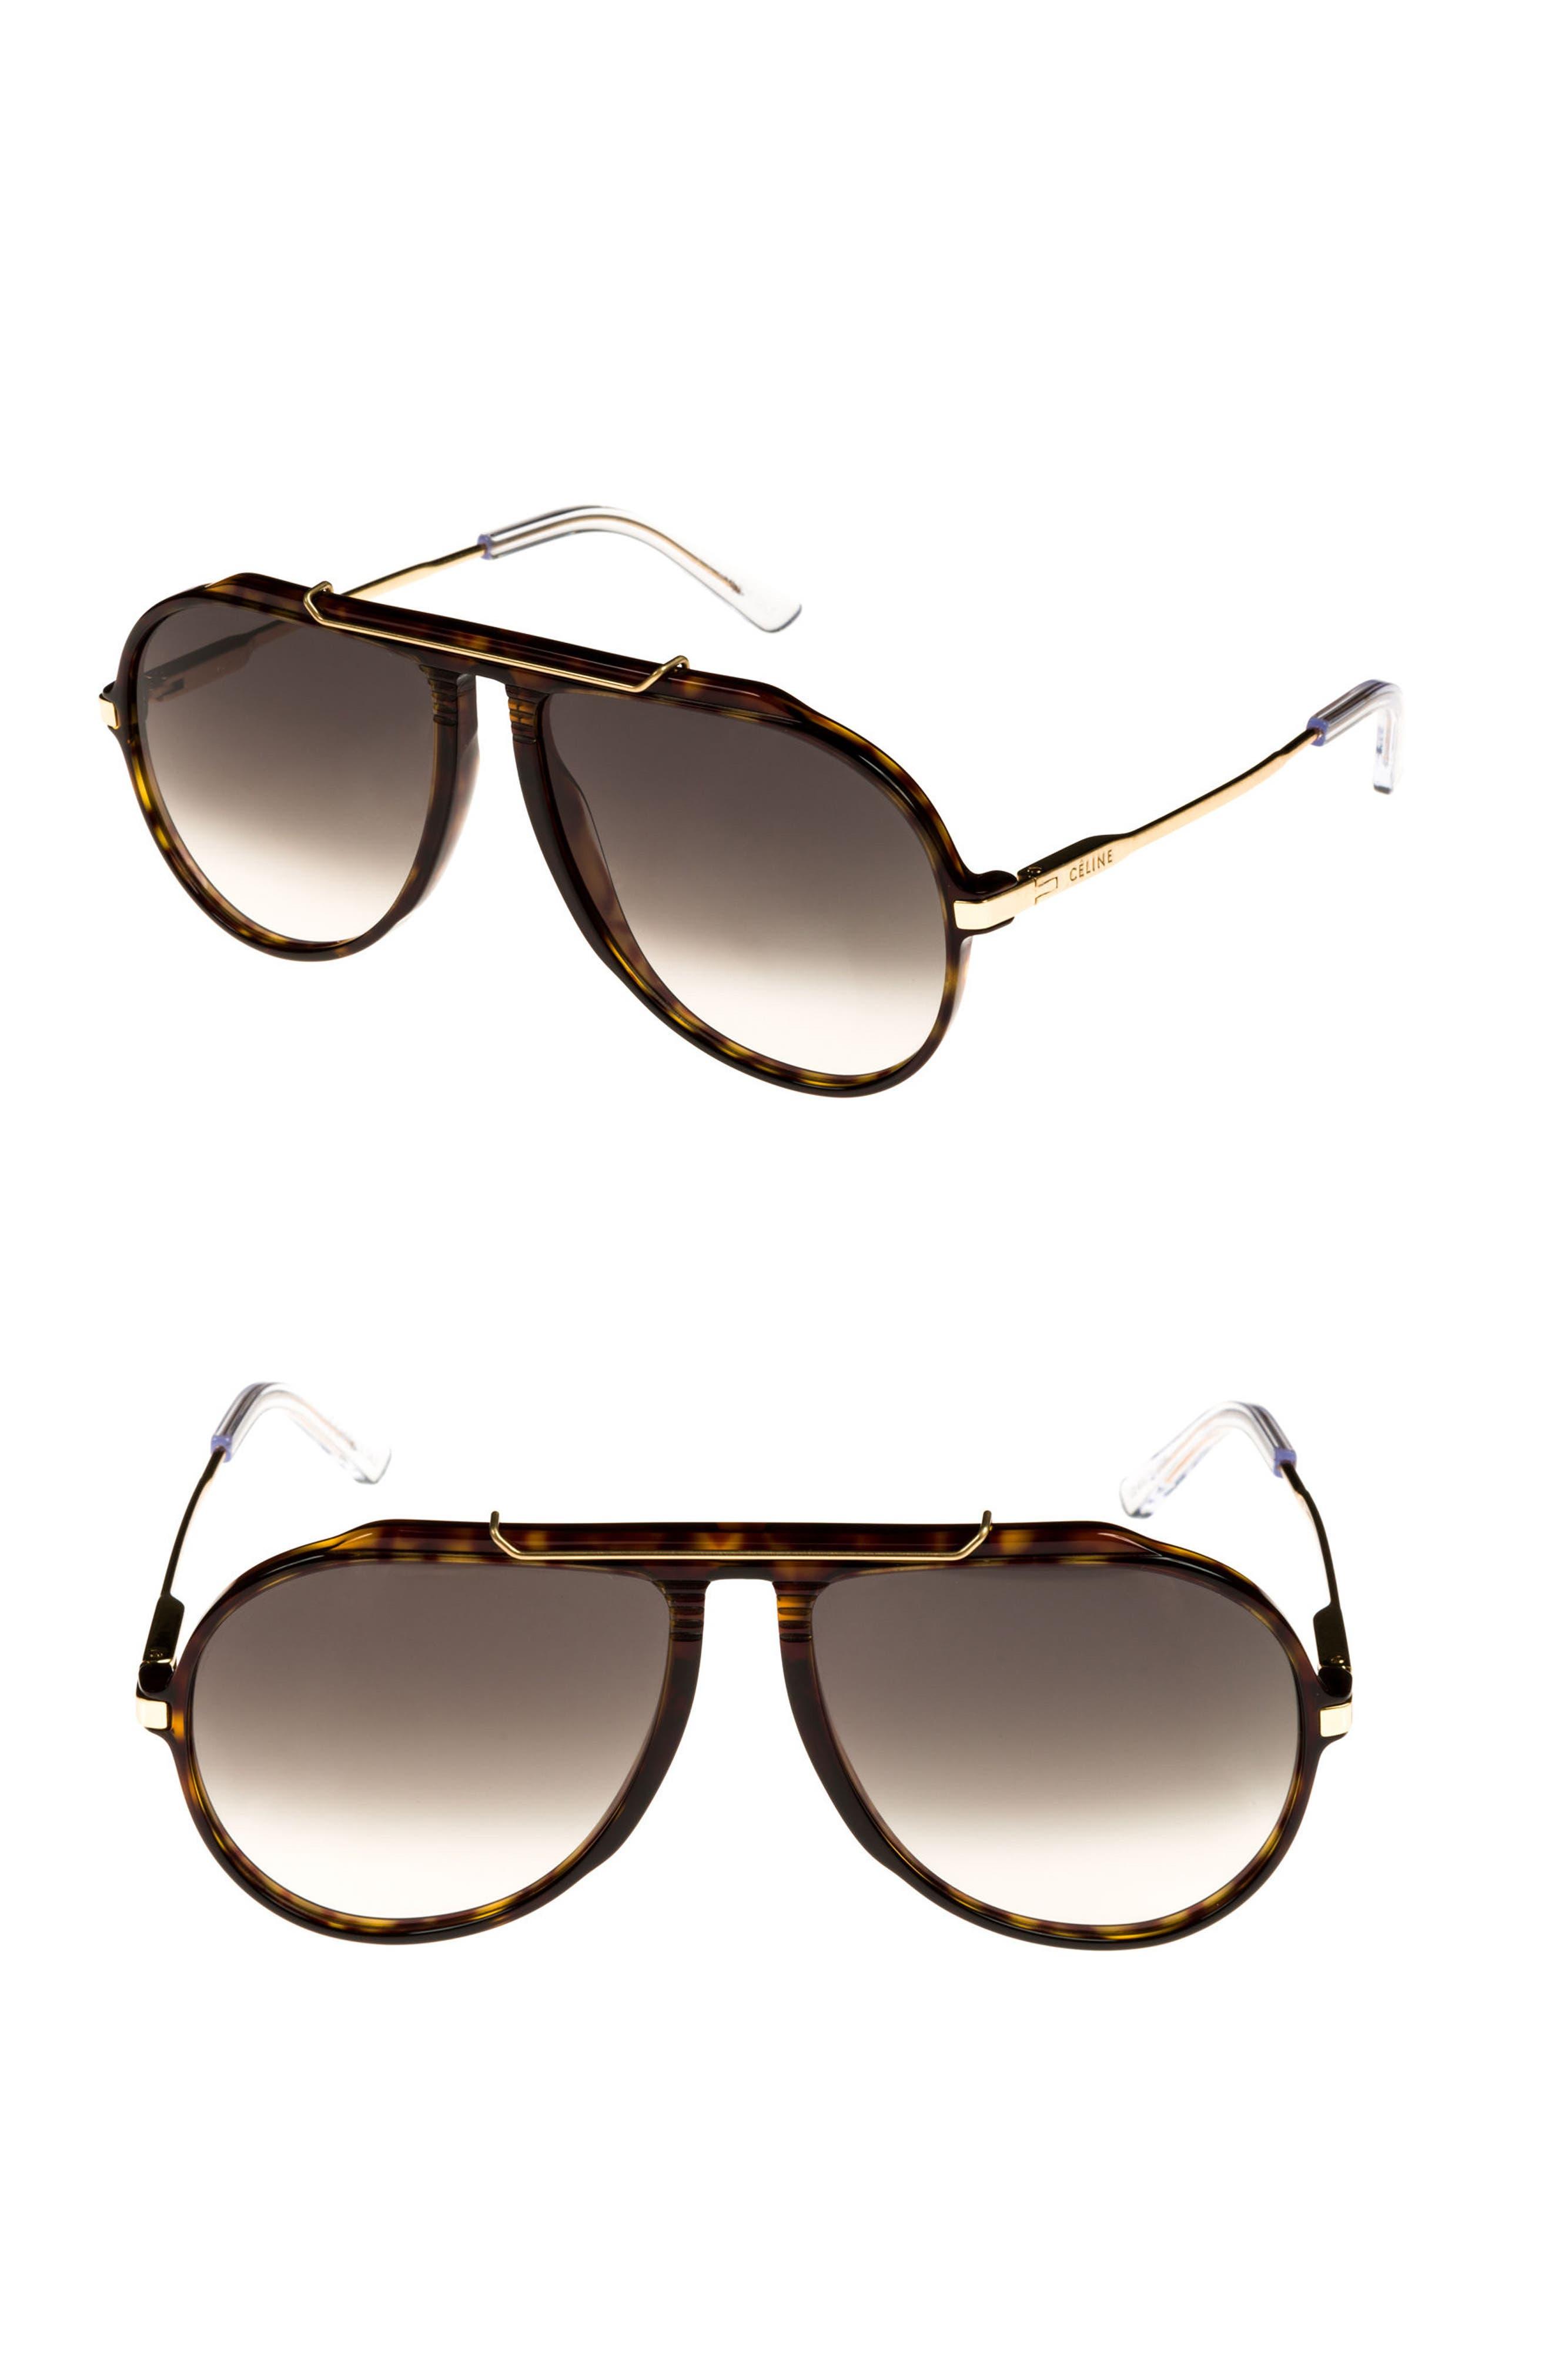 60mm Gradient Aviator Sunglasses,                         Main,                         color, DARK HAVANA/ GOLD/ GREEN